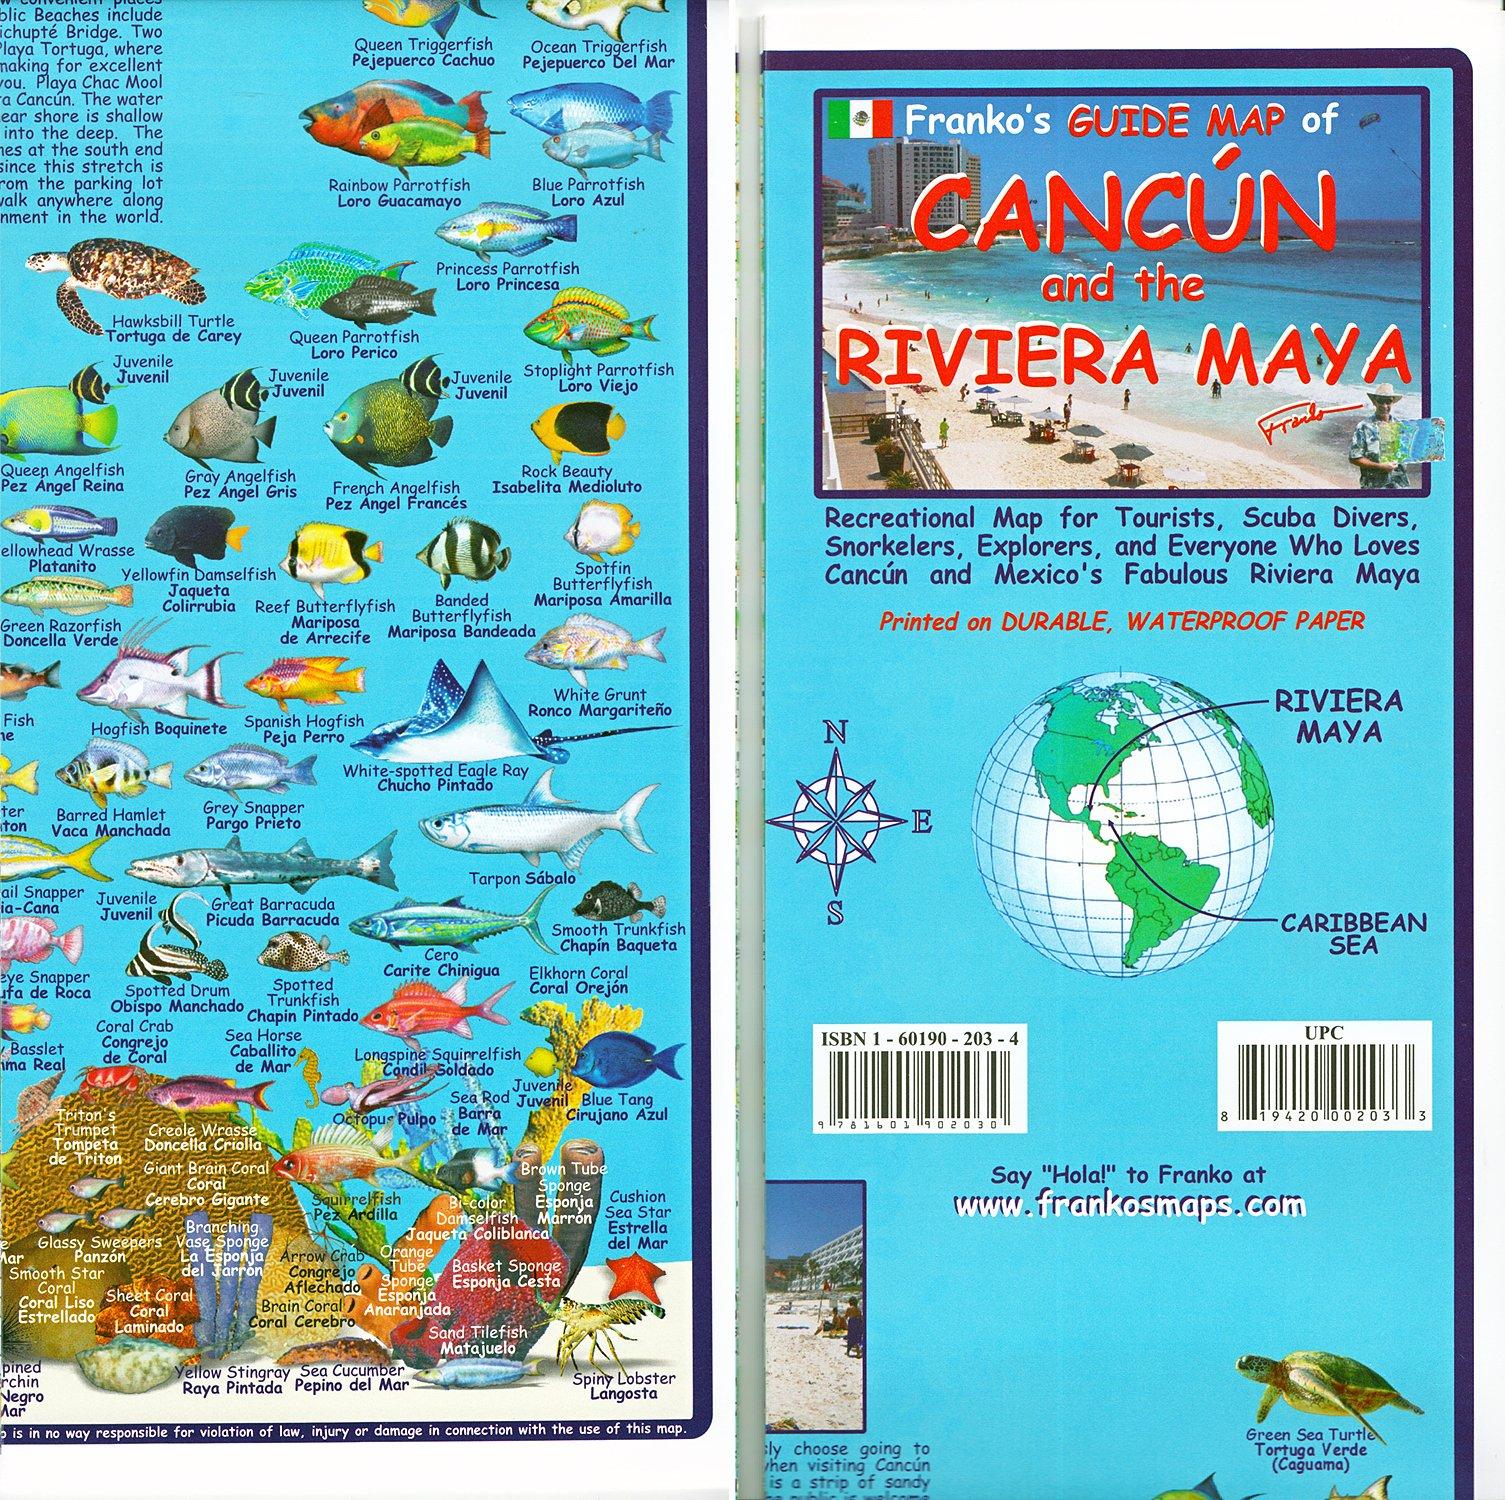 Franko's Guide Map of Cancun and the Riviera Maya (English ... on south america map, world map, mexico map, merida map, yucatan map, caribbean map, xcaret map, cabo san lucas map, playa del carmen map, machu picchu map, central america map, cozumel map, puerto vallarta map, acapulco map, belize map, isla mujeres map, quintana roo map, tulum map, la paz map, riviera maya map,